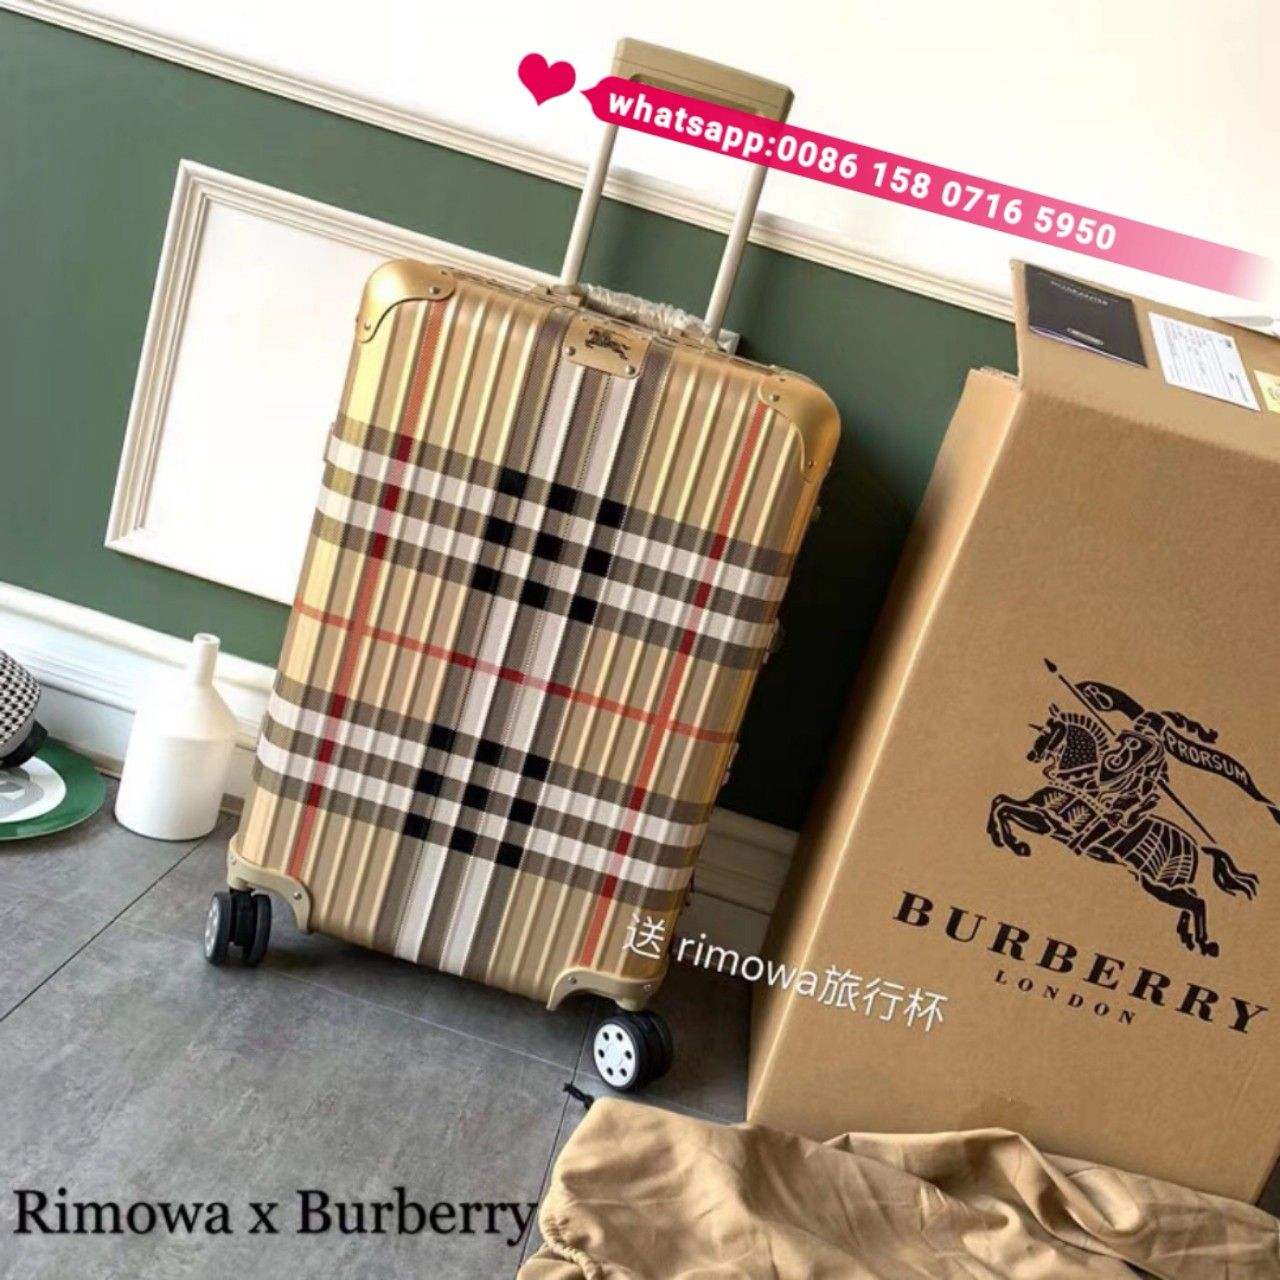 Burberry Rimowa travel bags case   Rimowa, Travel bags